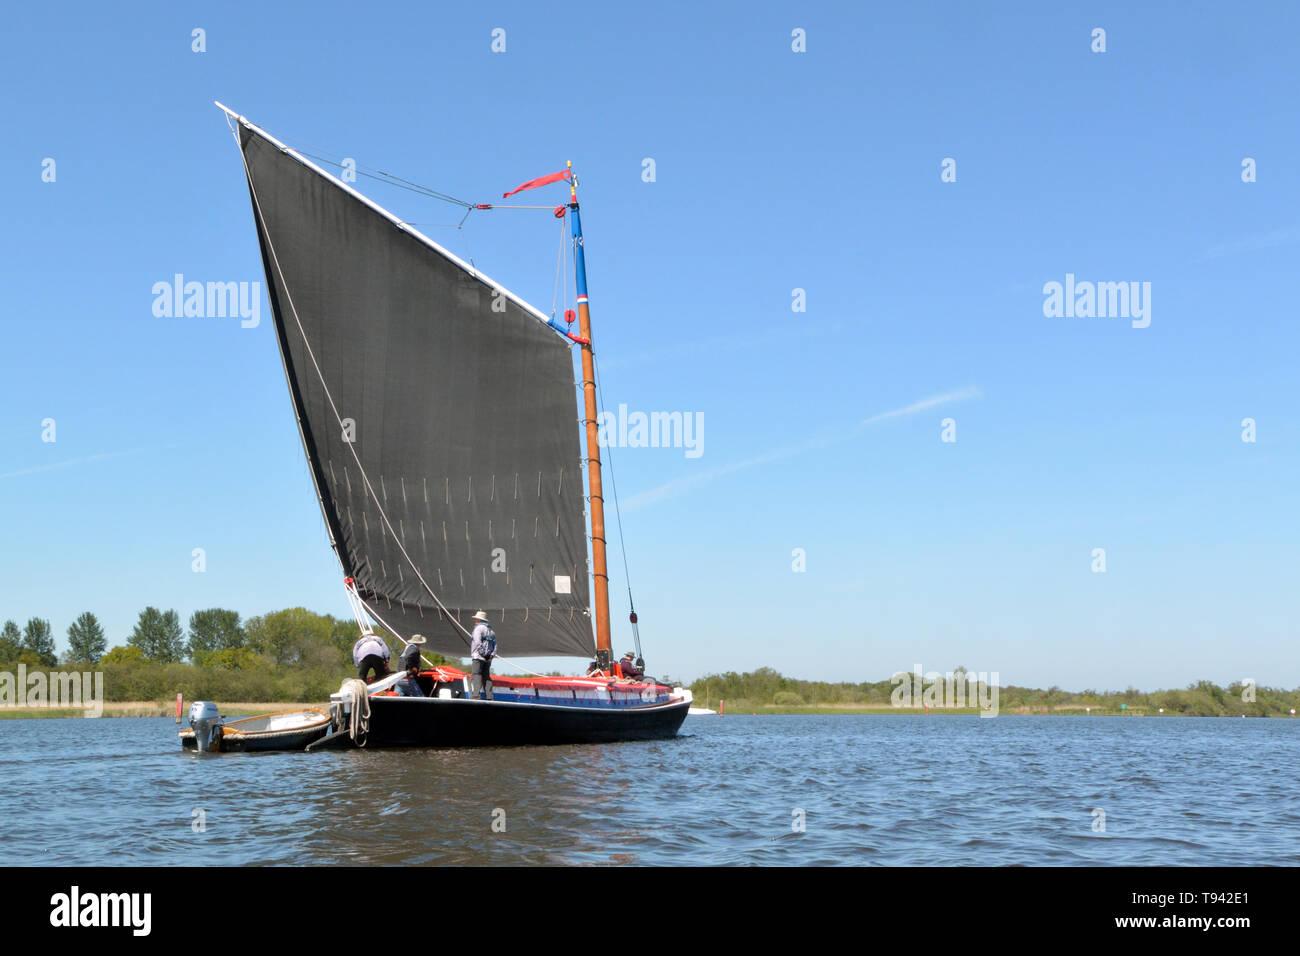 Historic trading wherry Albion under sail on Barton Broad, Broads National Park, Norfolk, UK Stock Photo